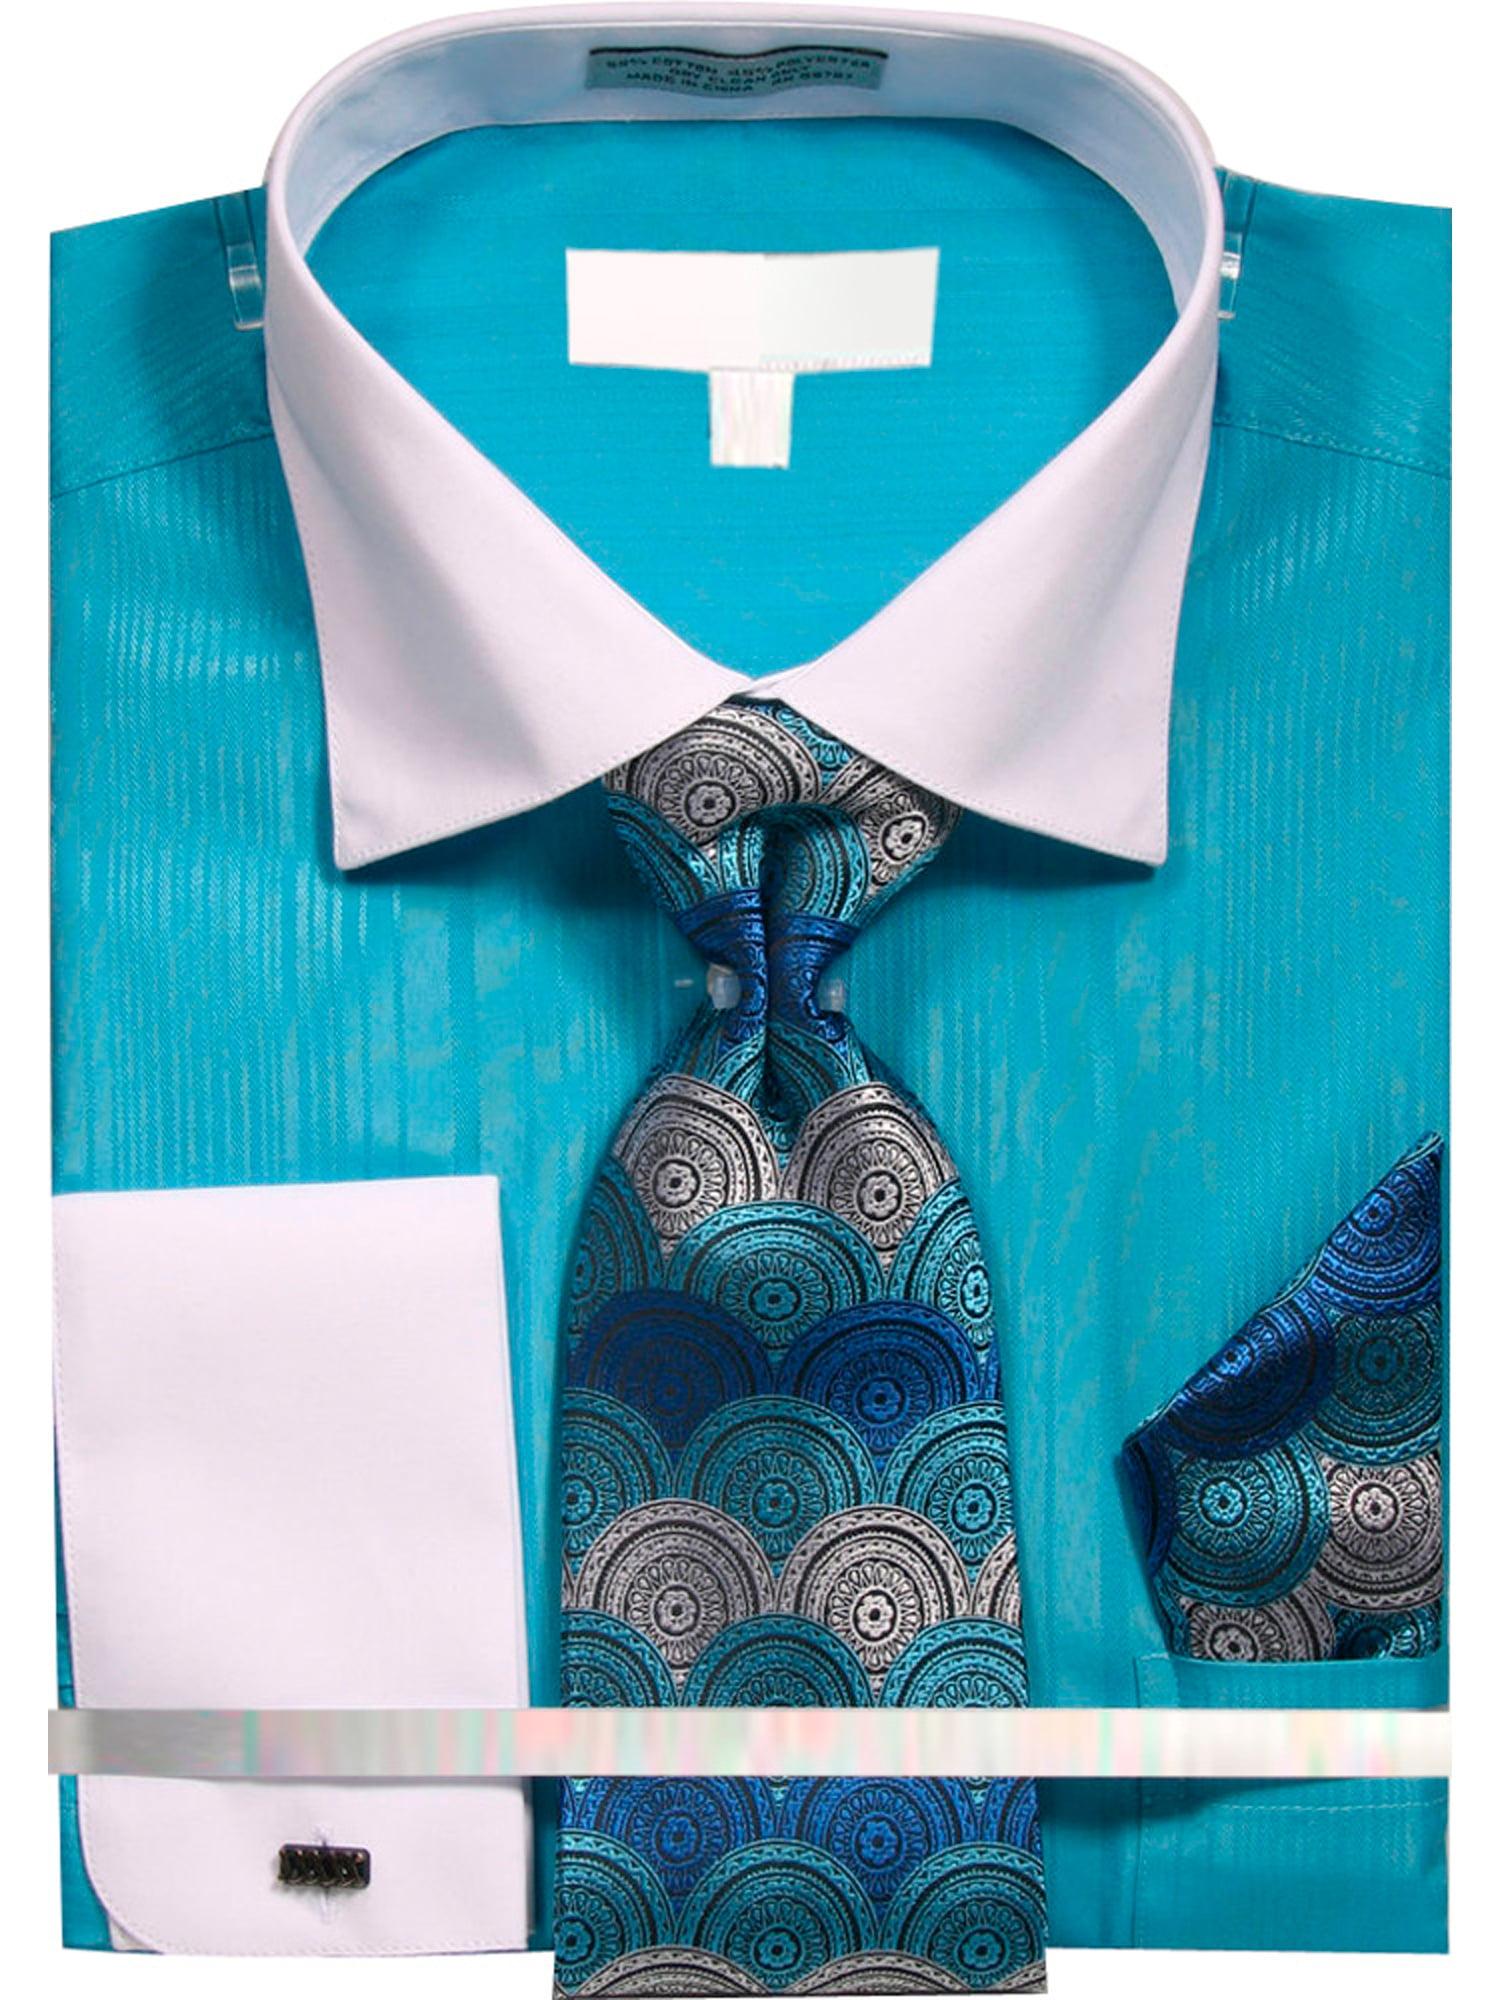 men's variegated satin stripe dress shirt with tie hanky and cufflinks